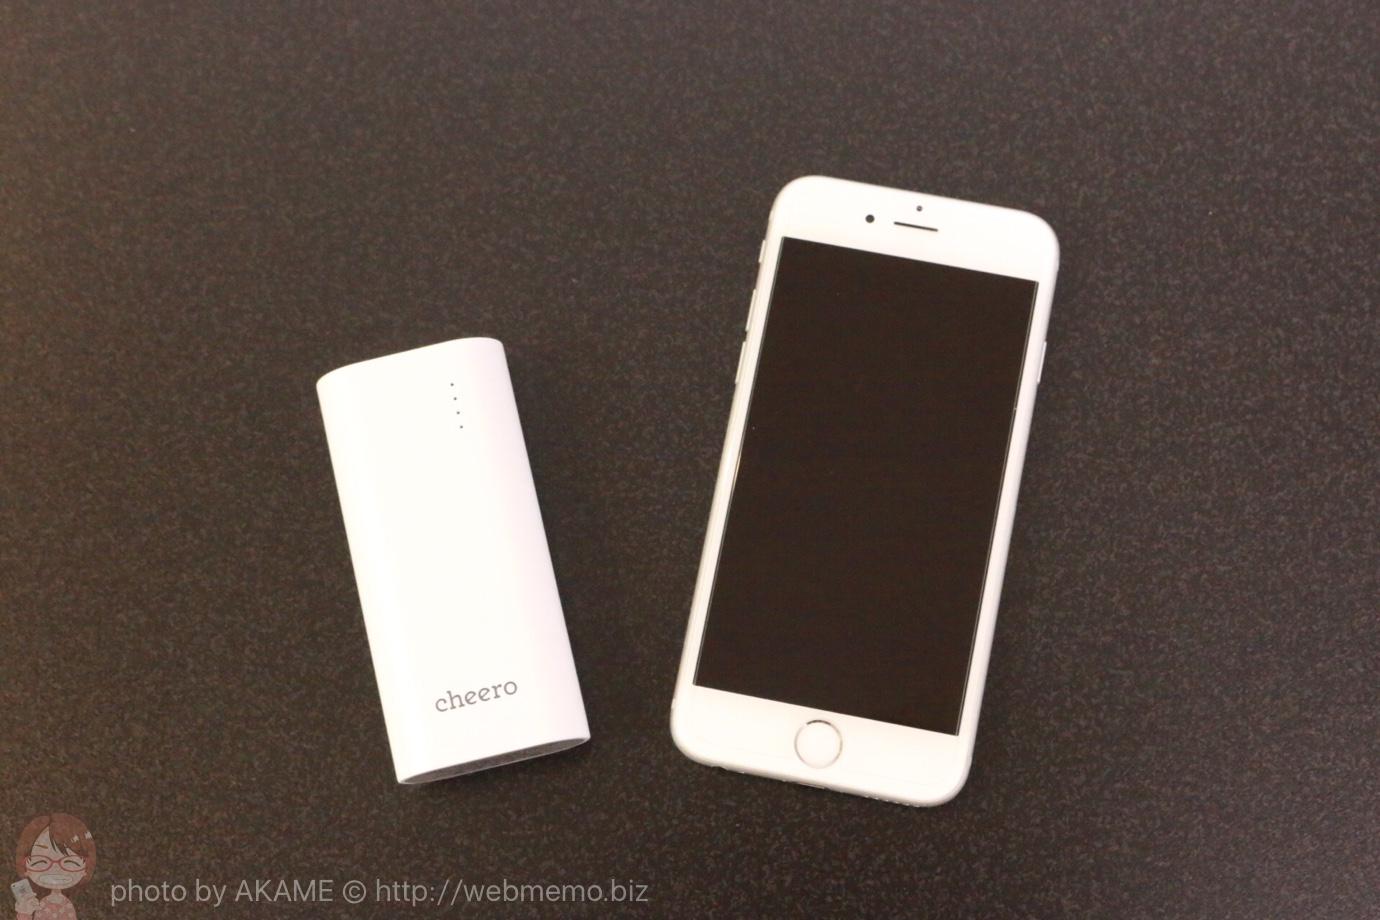 cheero Power Plus 3 mini 5200mAh ホワイトとiPhone 6のサイズ比較